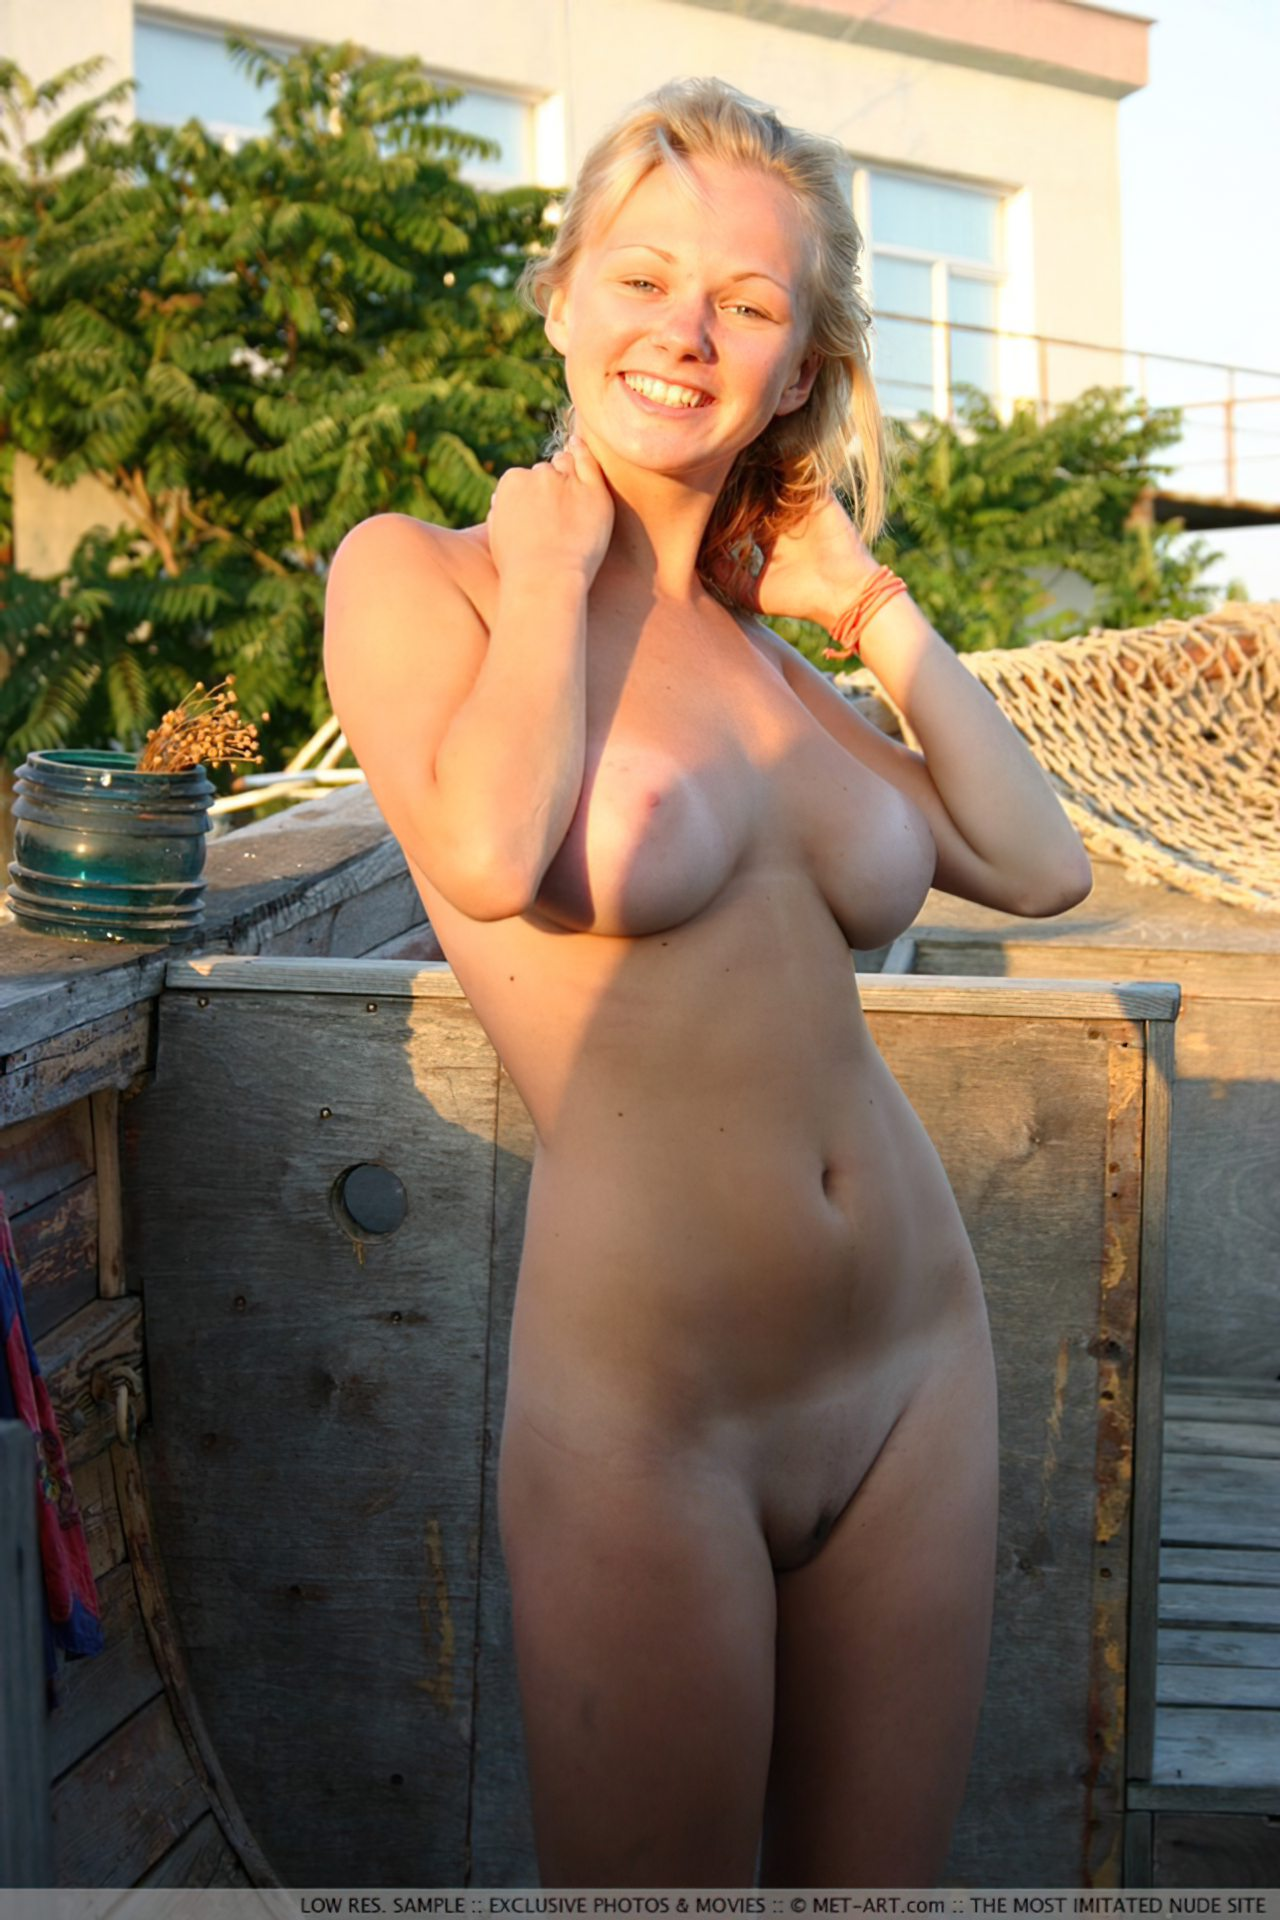 Loirinha Gostosa (18)